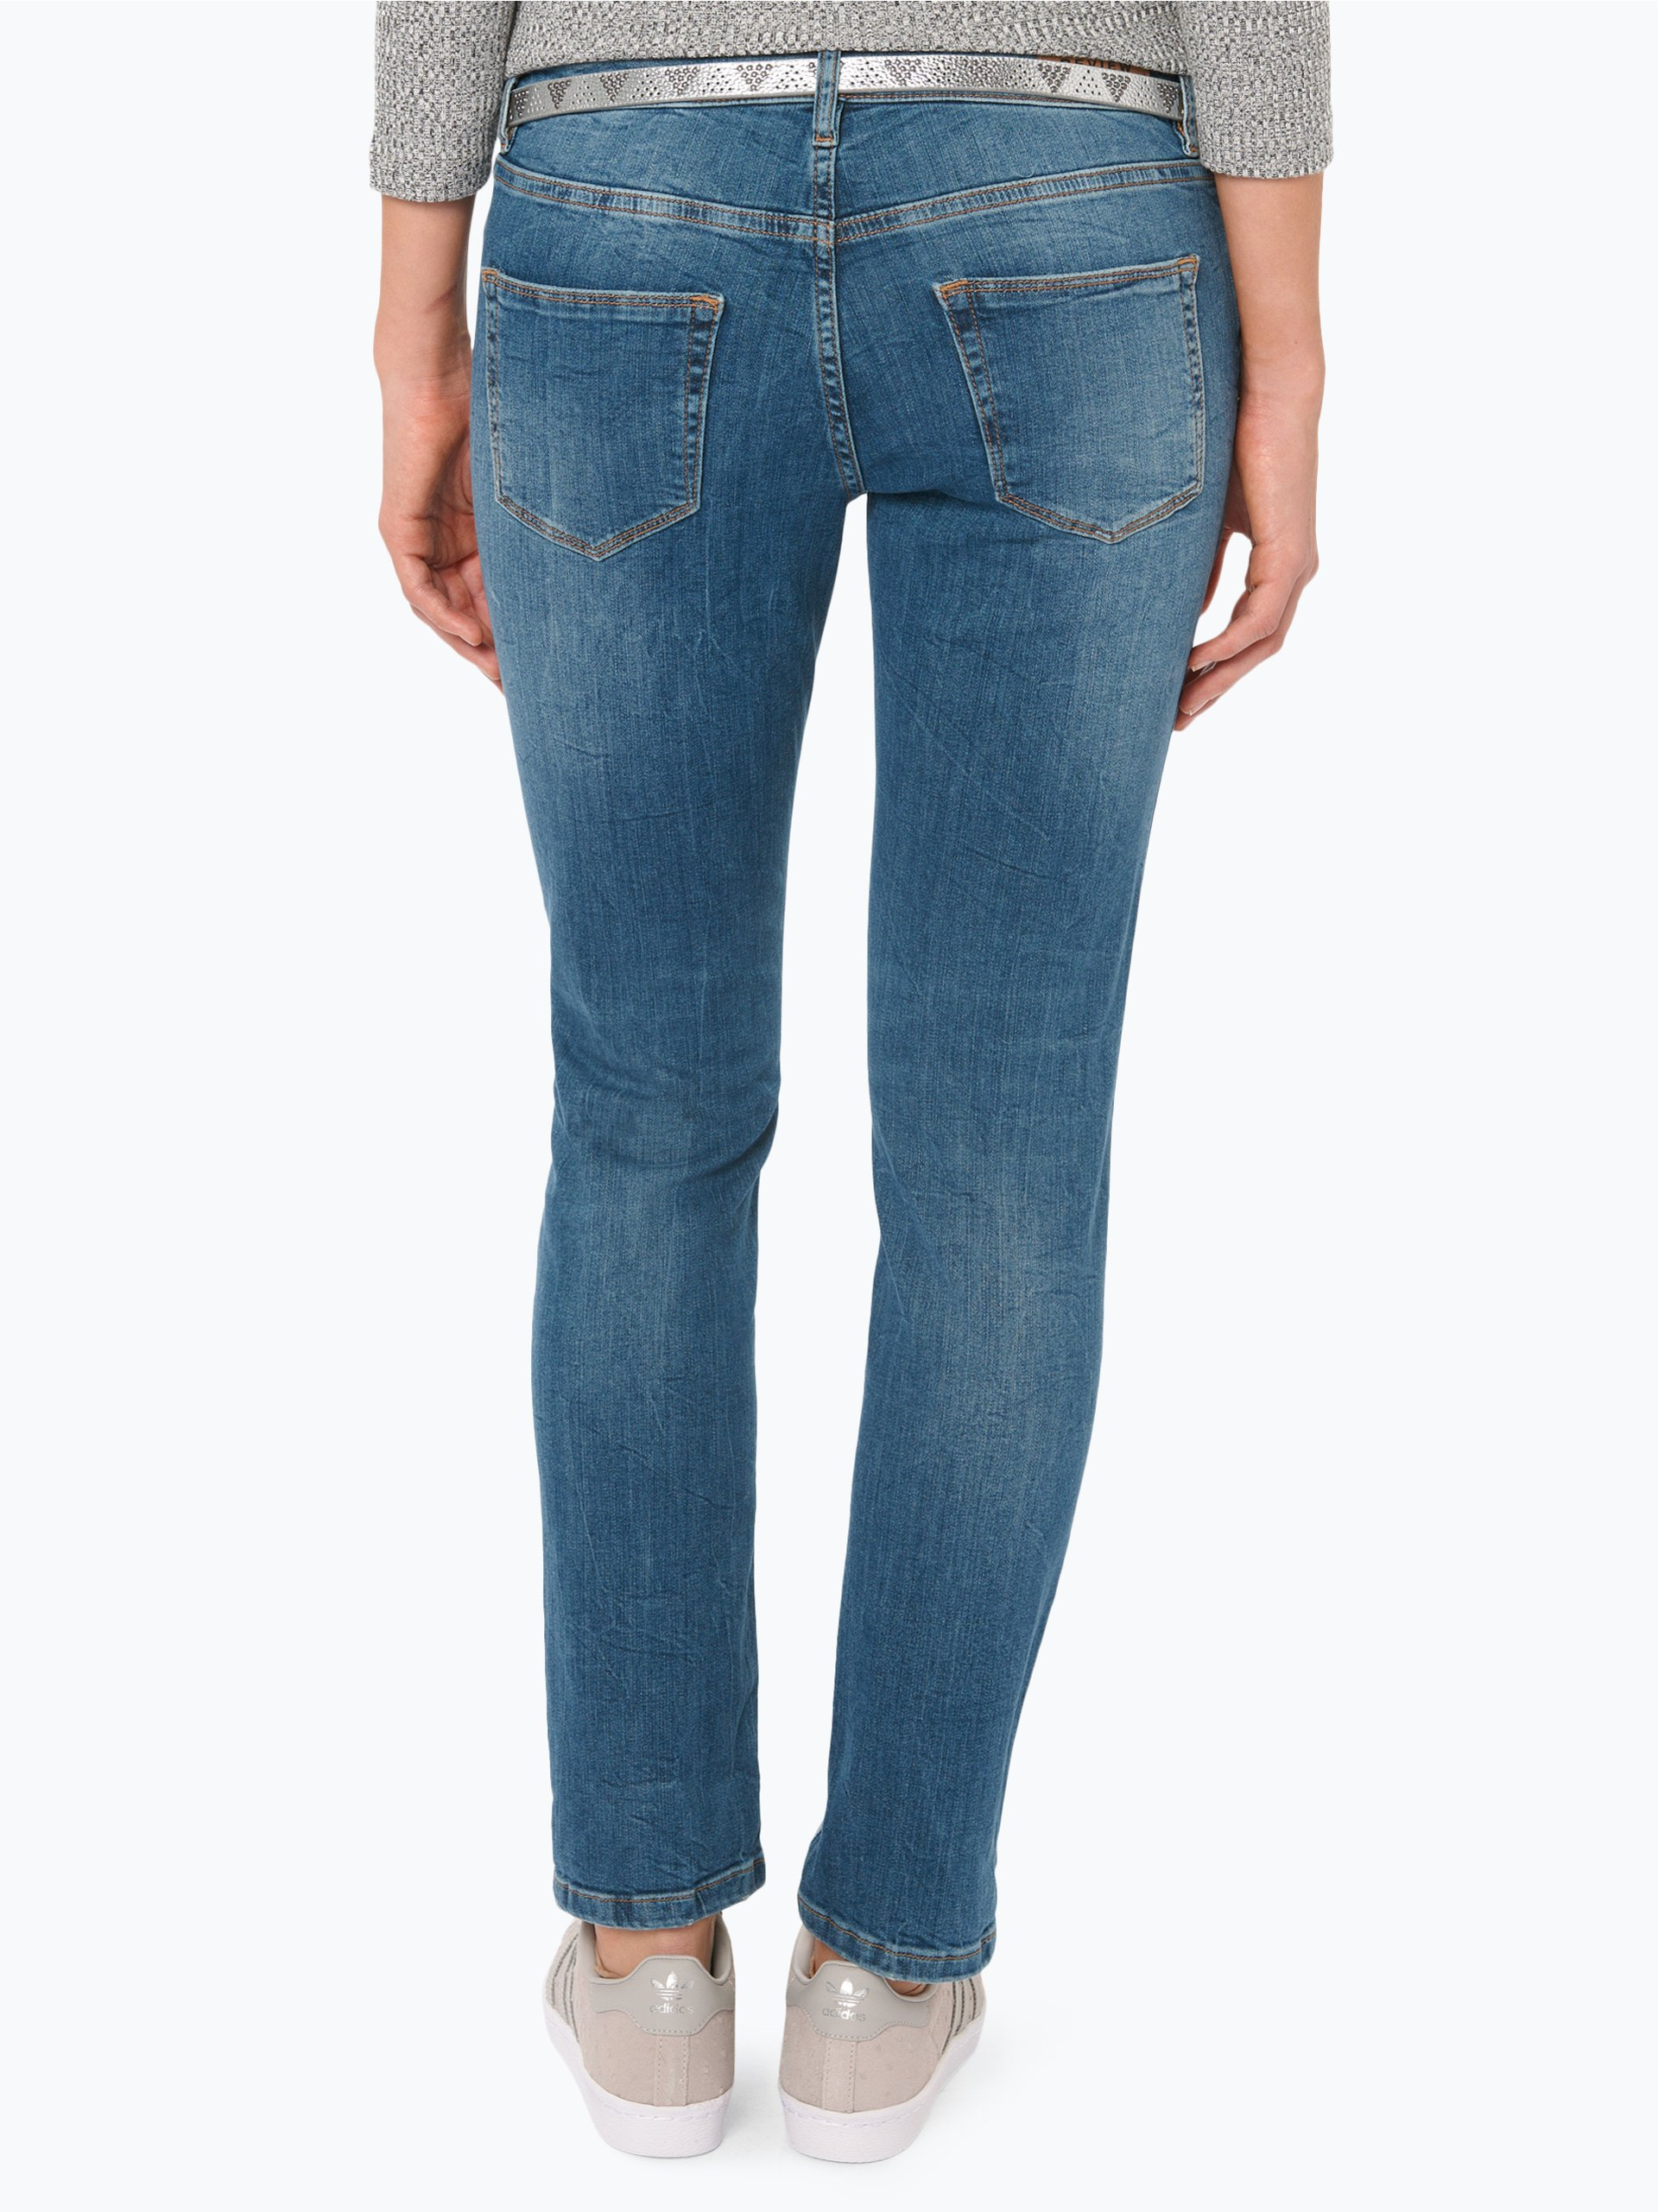 review damen jeans susi slim blau uni online kaufen peek und cloppenburg de. Black Bedroom Furniture Sets. Home Design Ideas